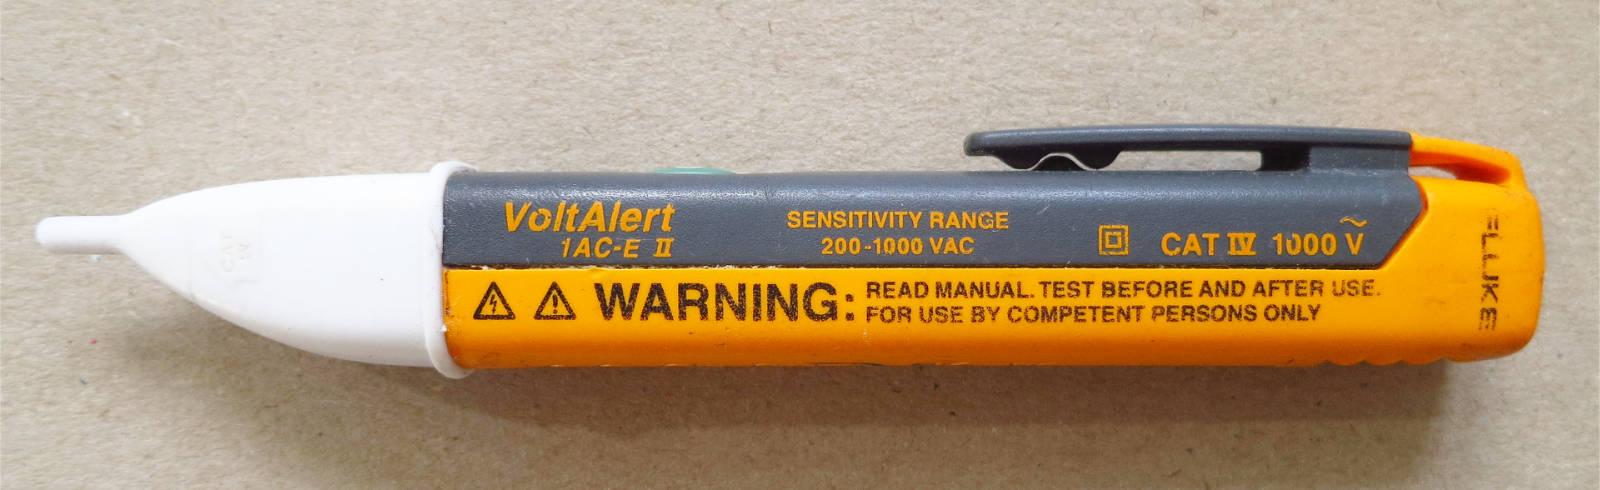 honeywell motorised valve faults  free heating advice